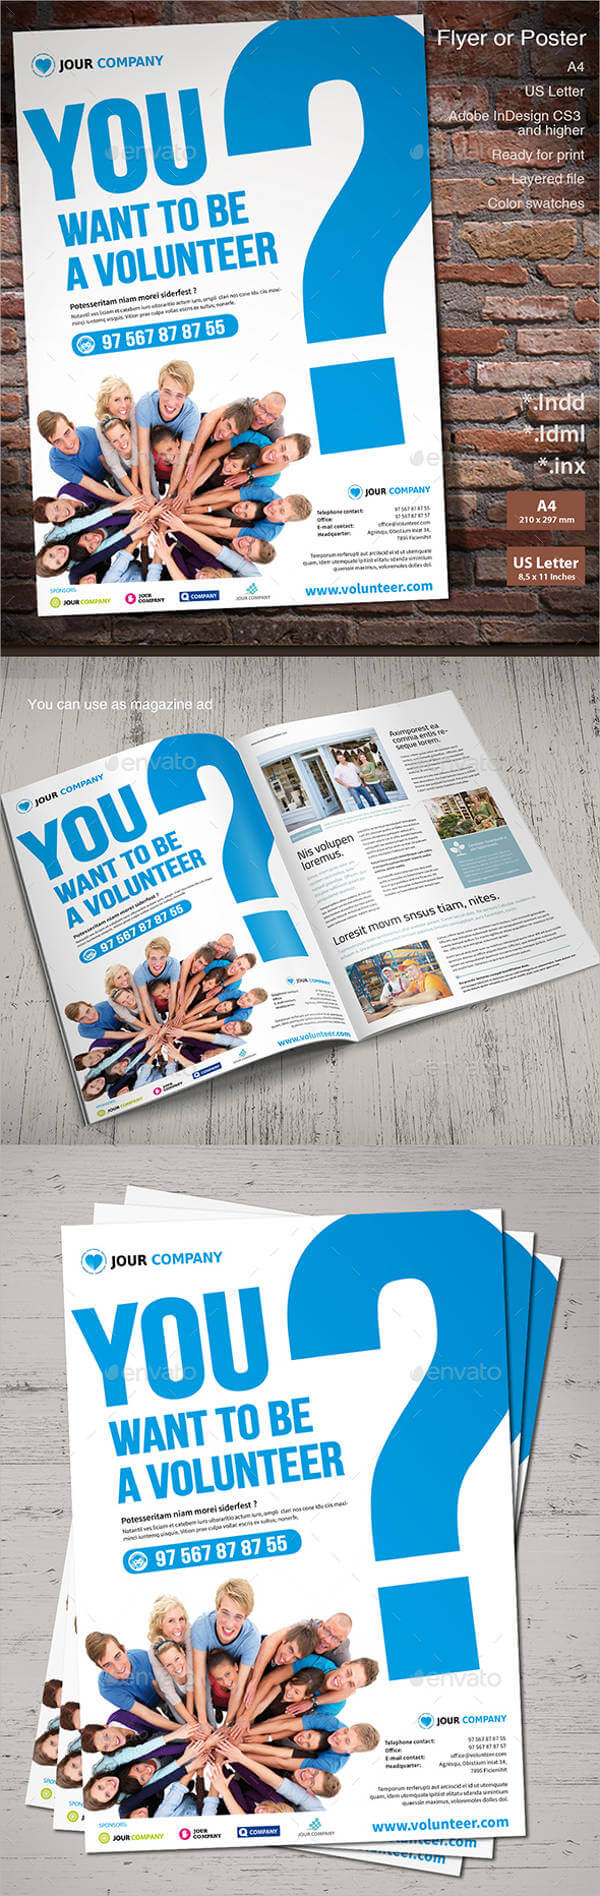 Volunteer Brochure Template